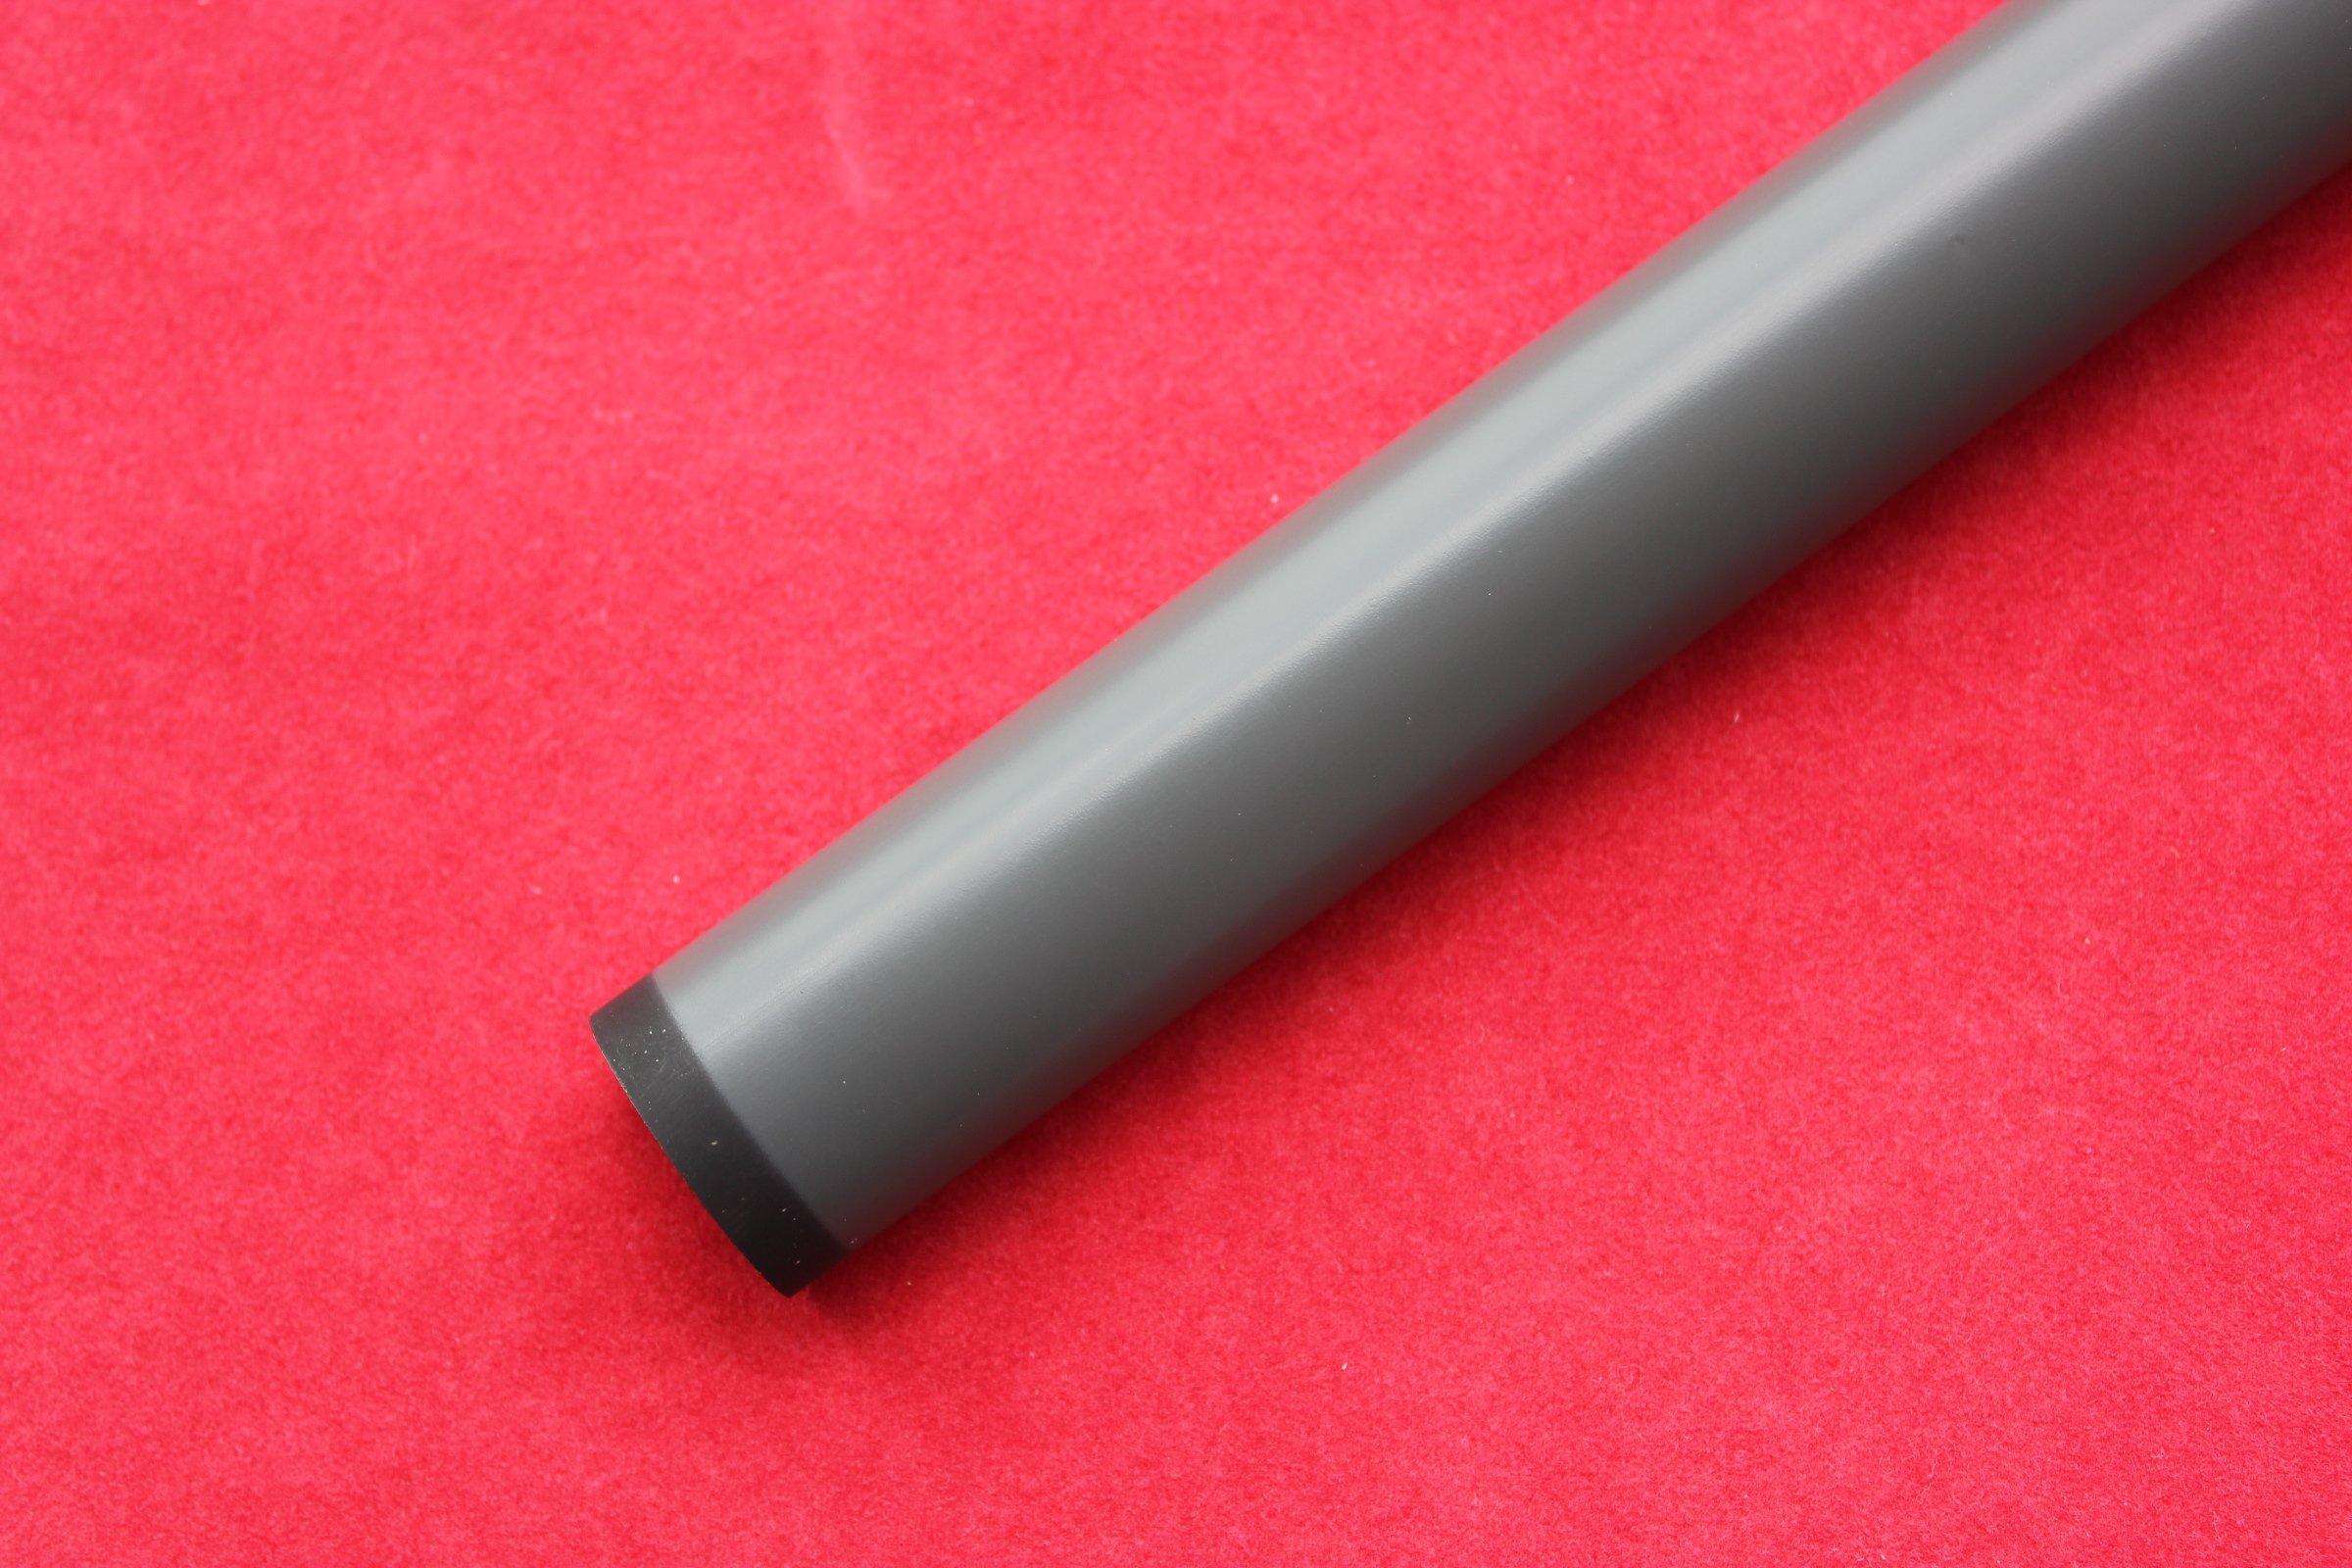 Altru Print 1160-RK-AP Roller Kit for HP LaserJet 1160 1320